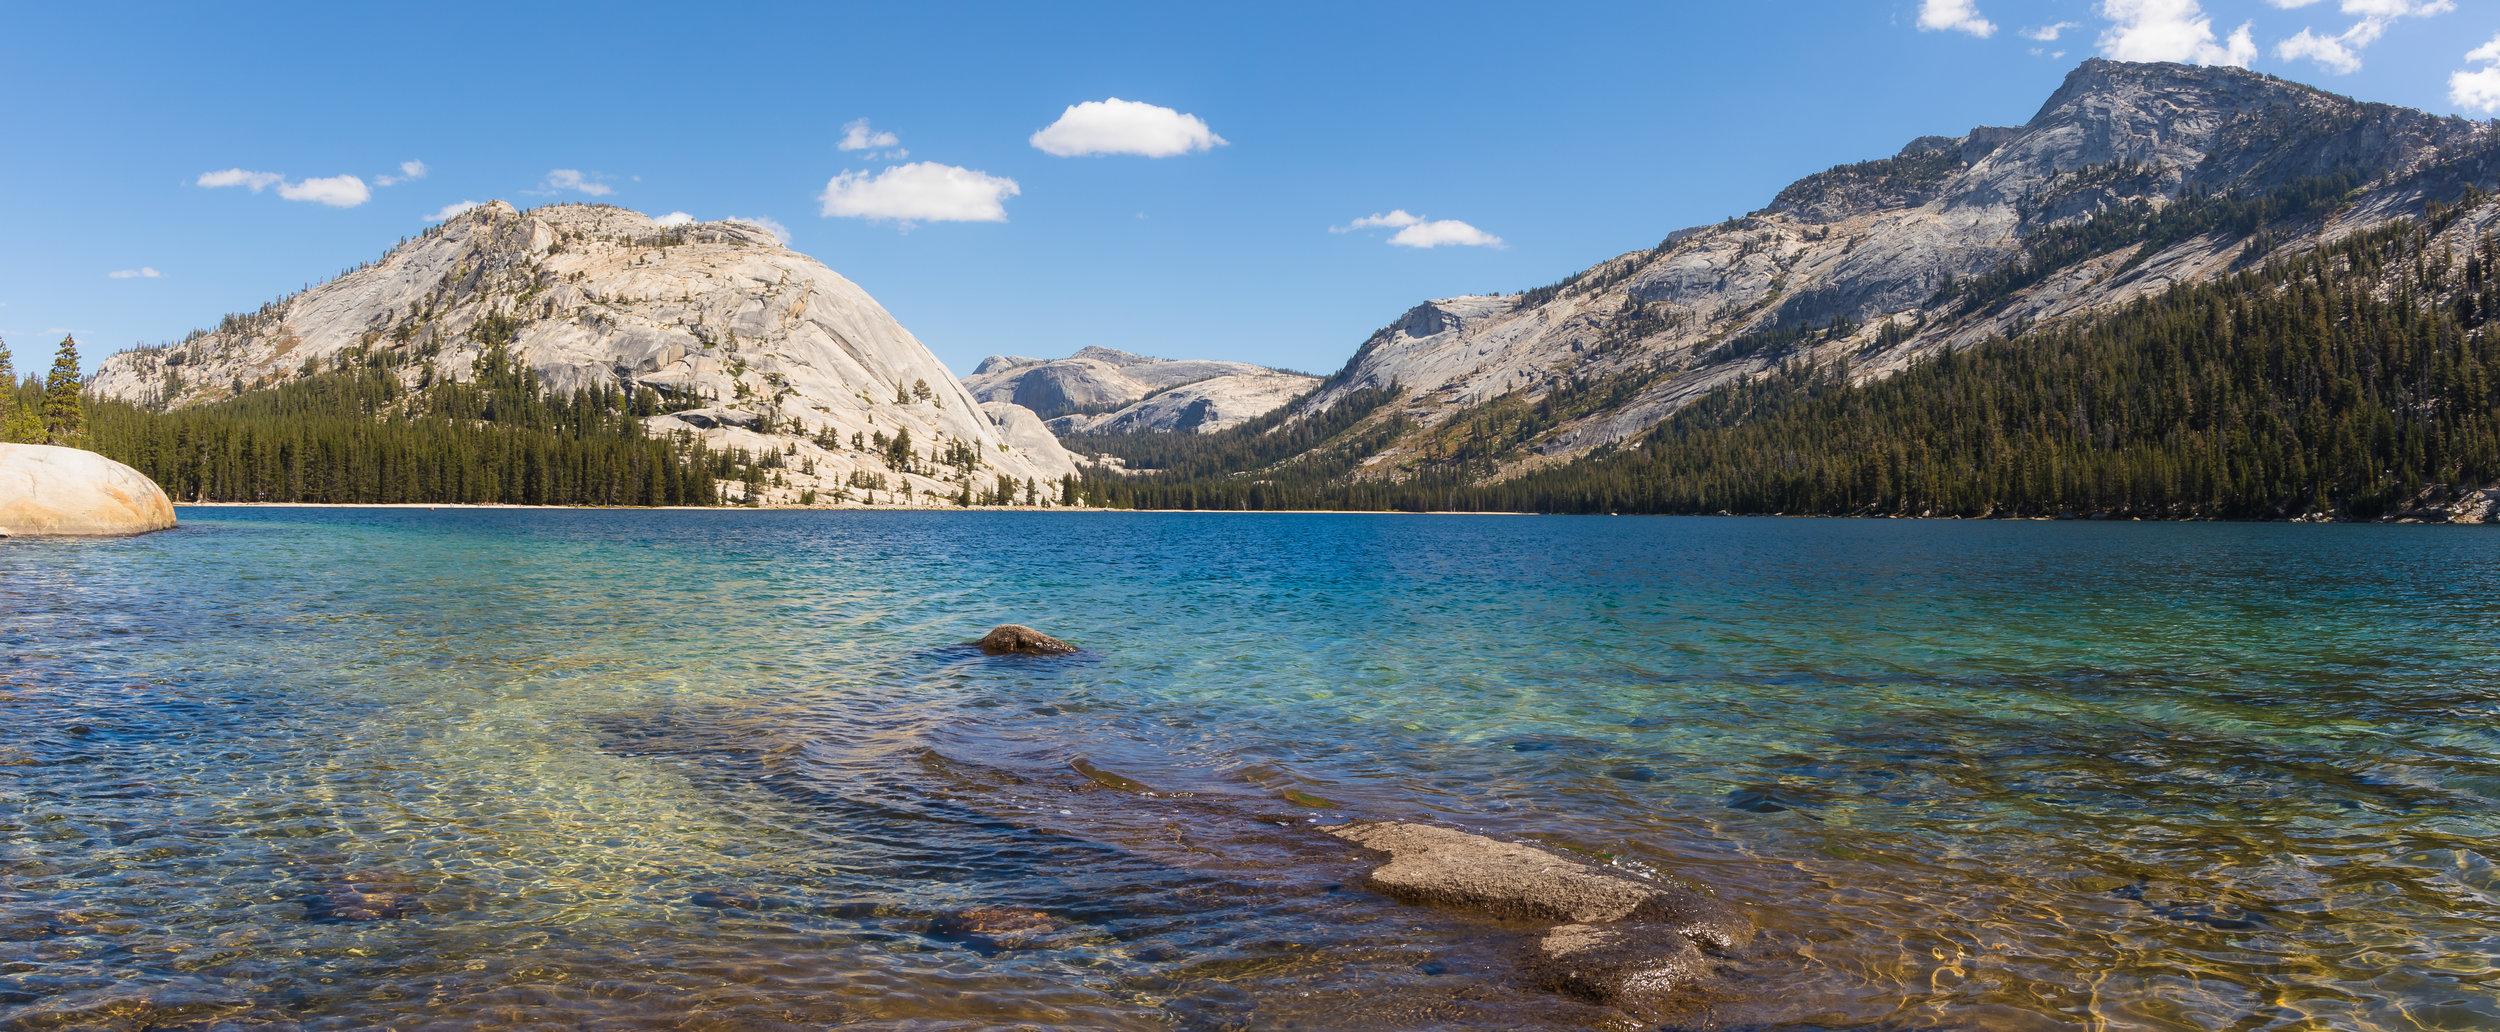 Tenaya Lake, Yosemite National Park, CA.